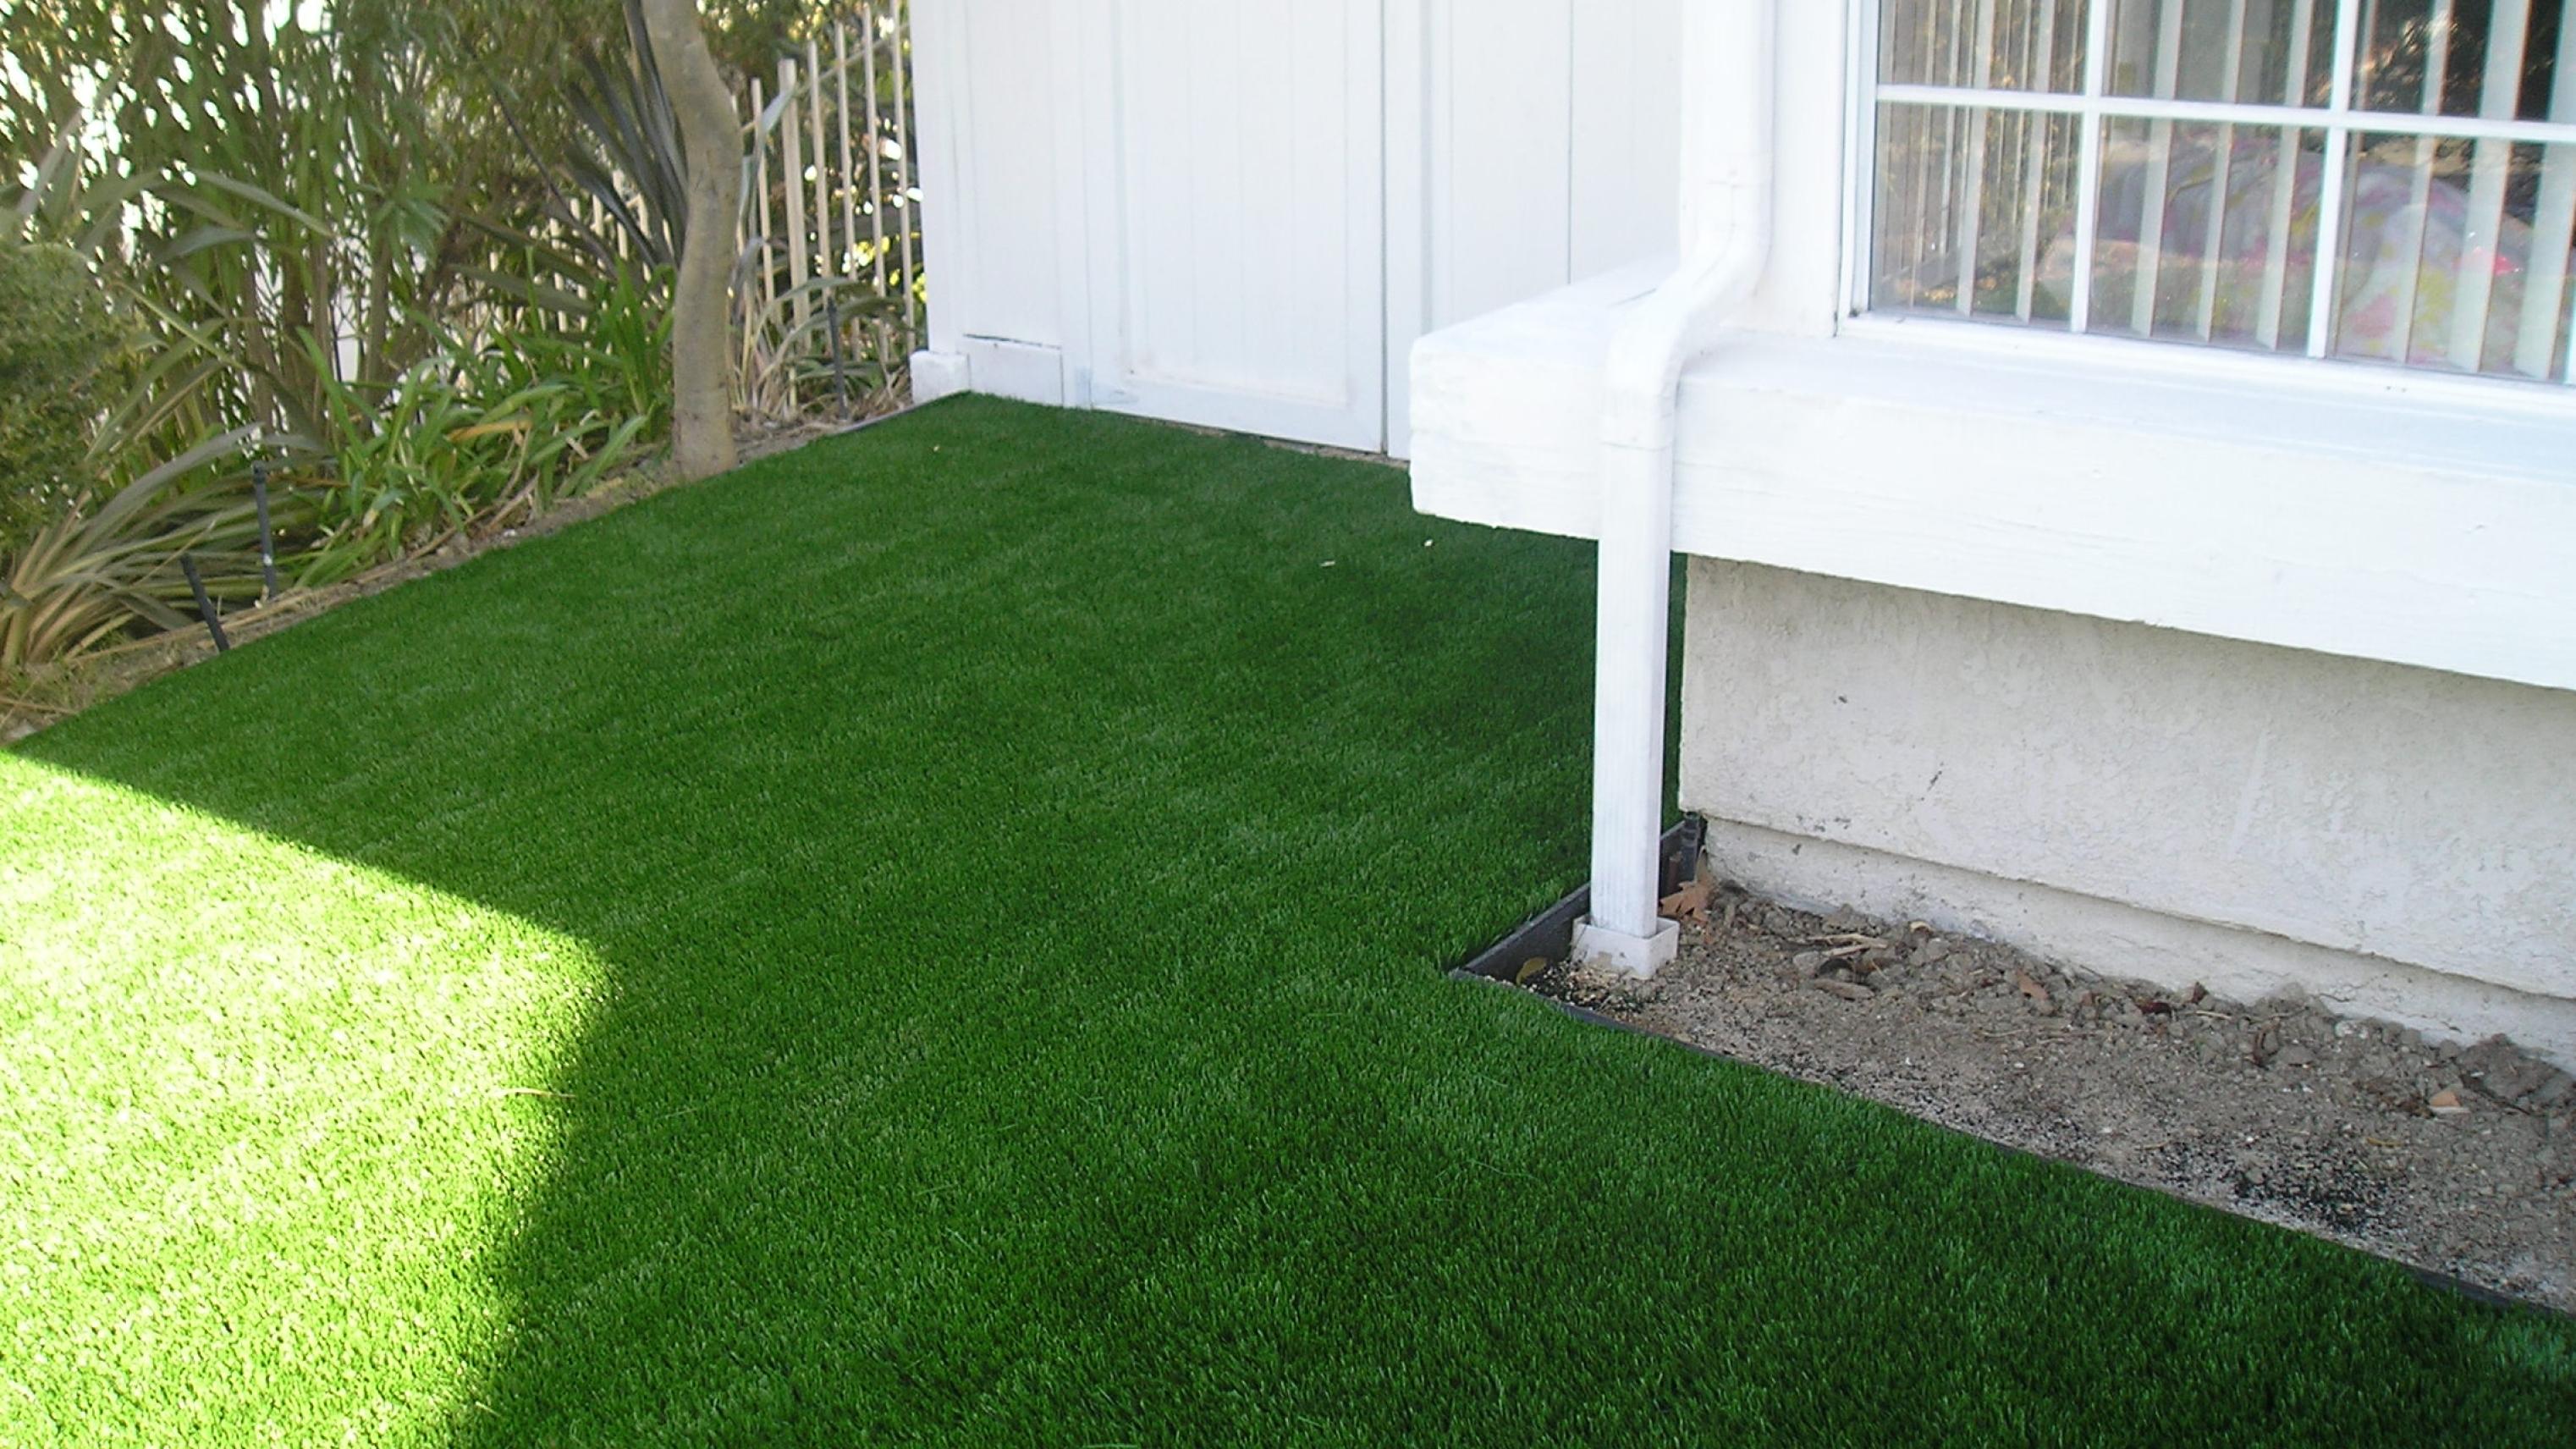 Super Natural 60 artificial lawn,synthetic lawn,fake lawn,turf lawn,fake grass lawn